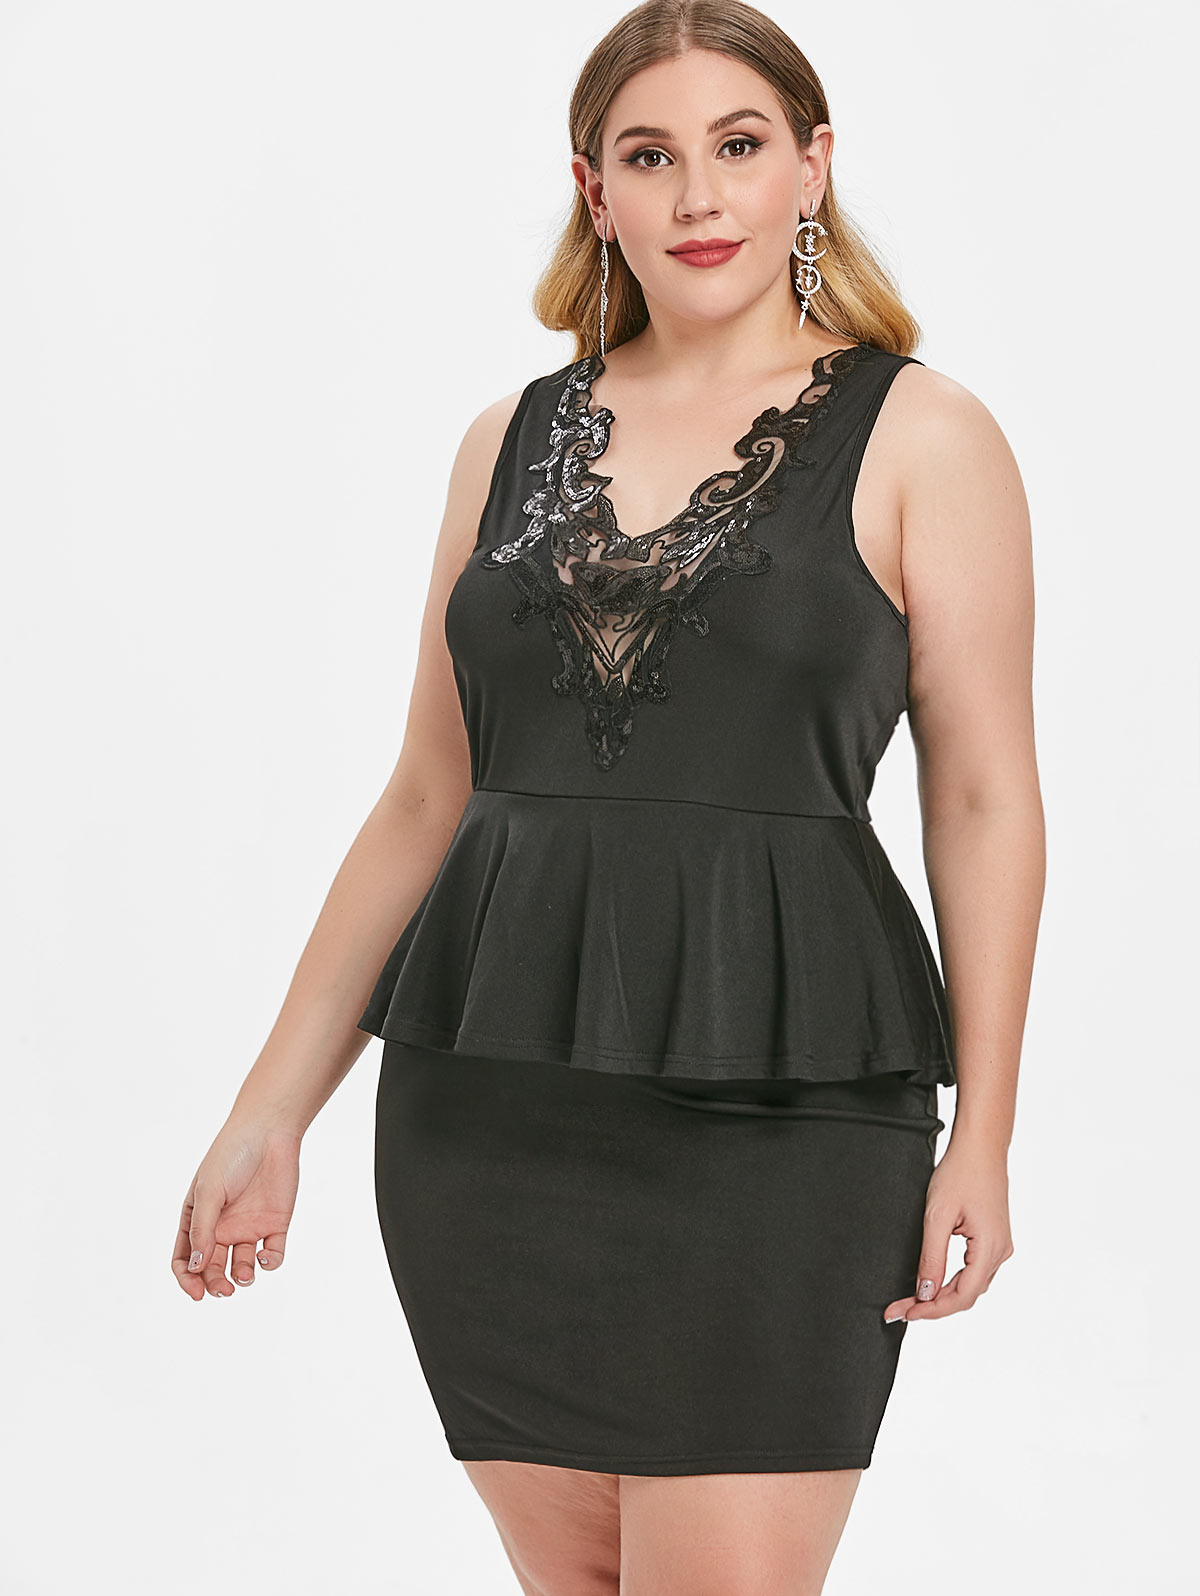 Buy sequin peplum dress and get free shipping on AliExpress.com e1a48bd53fe6